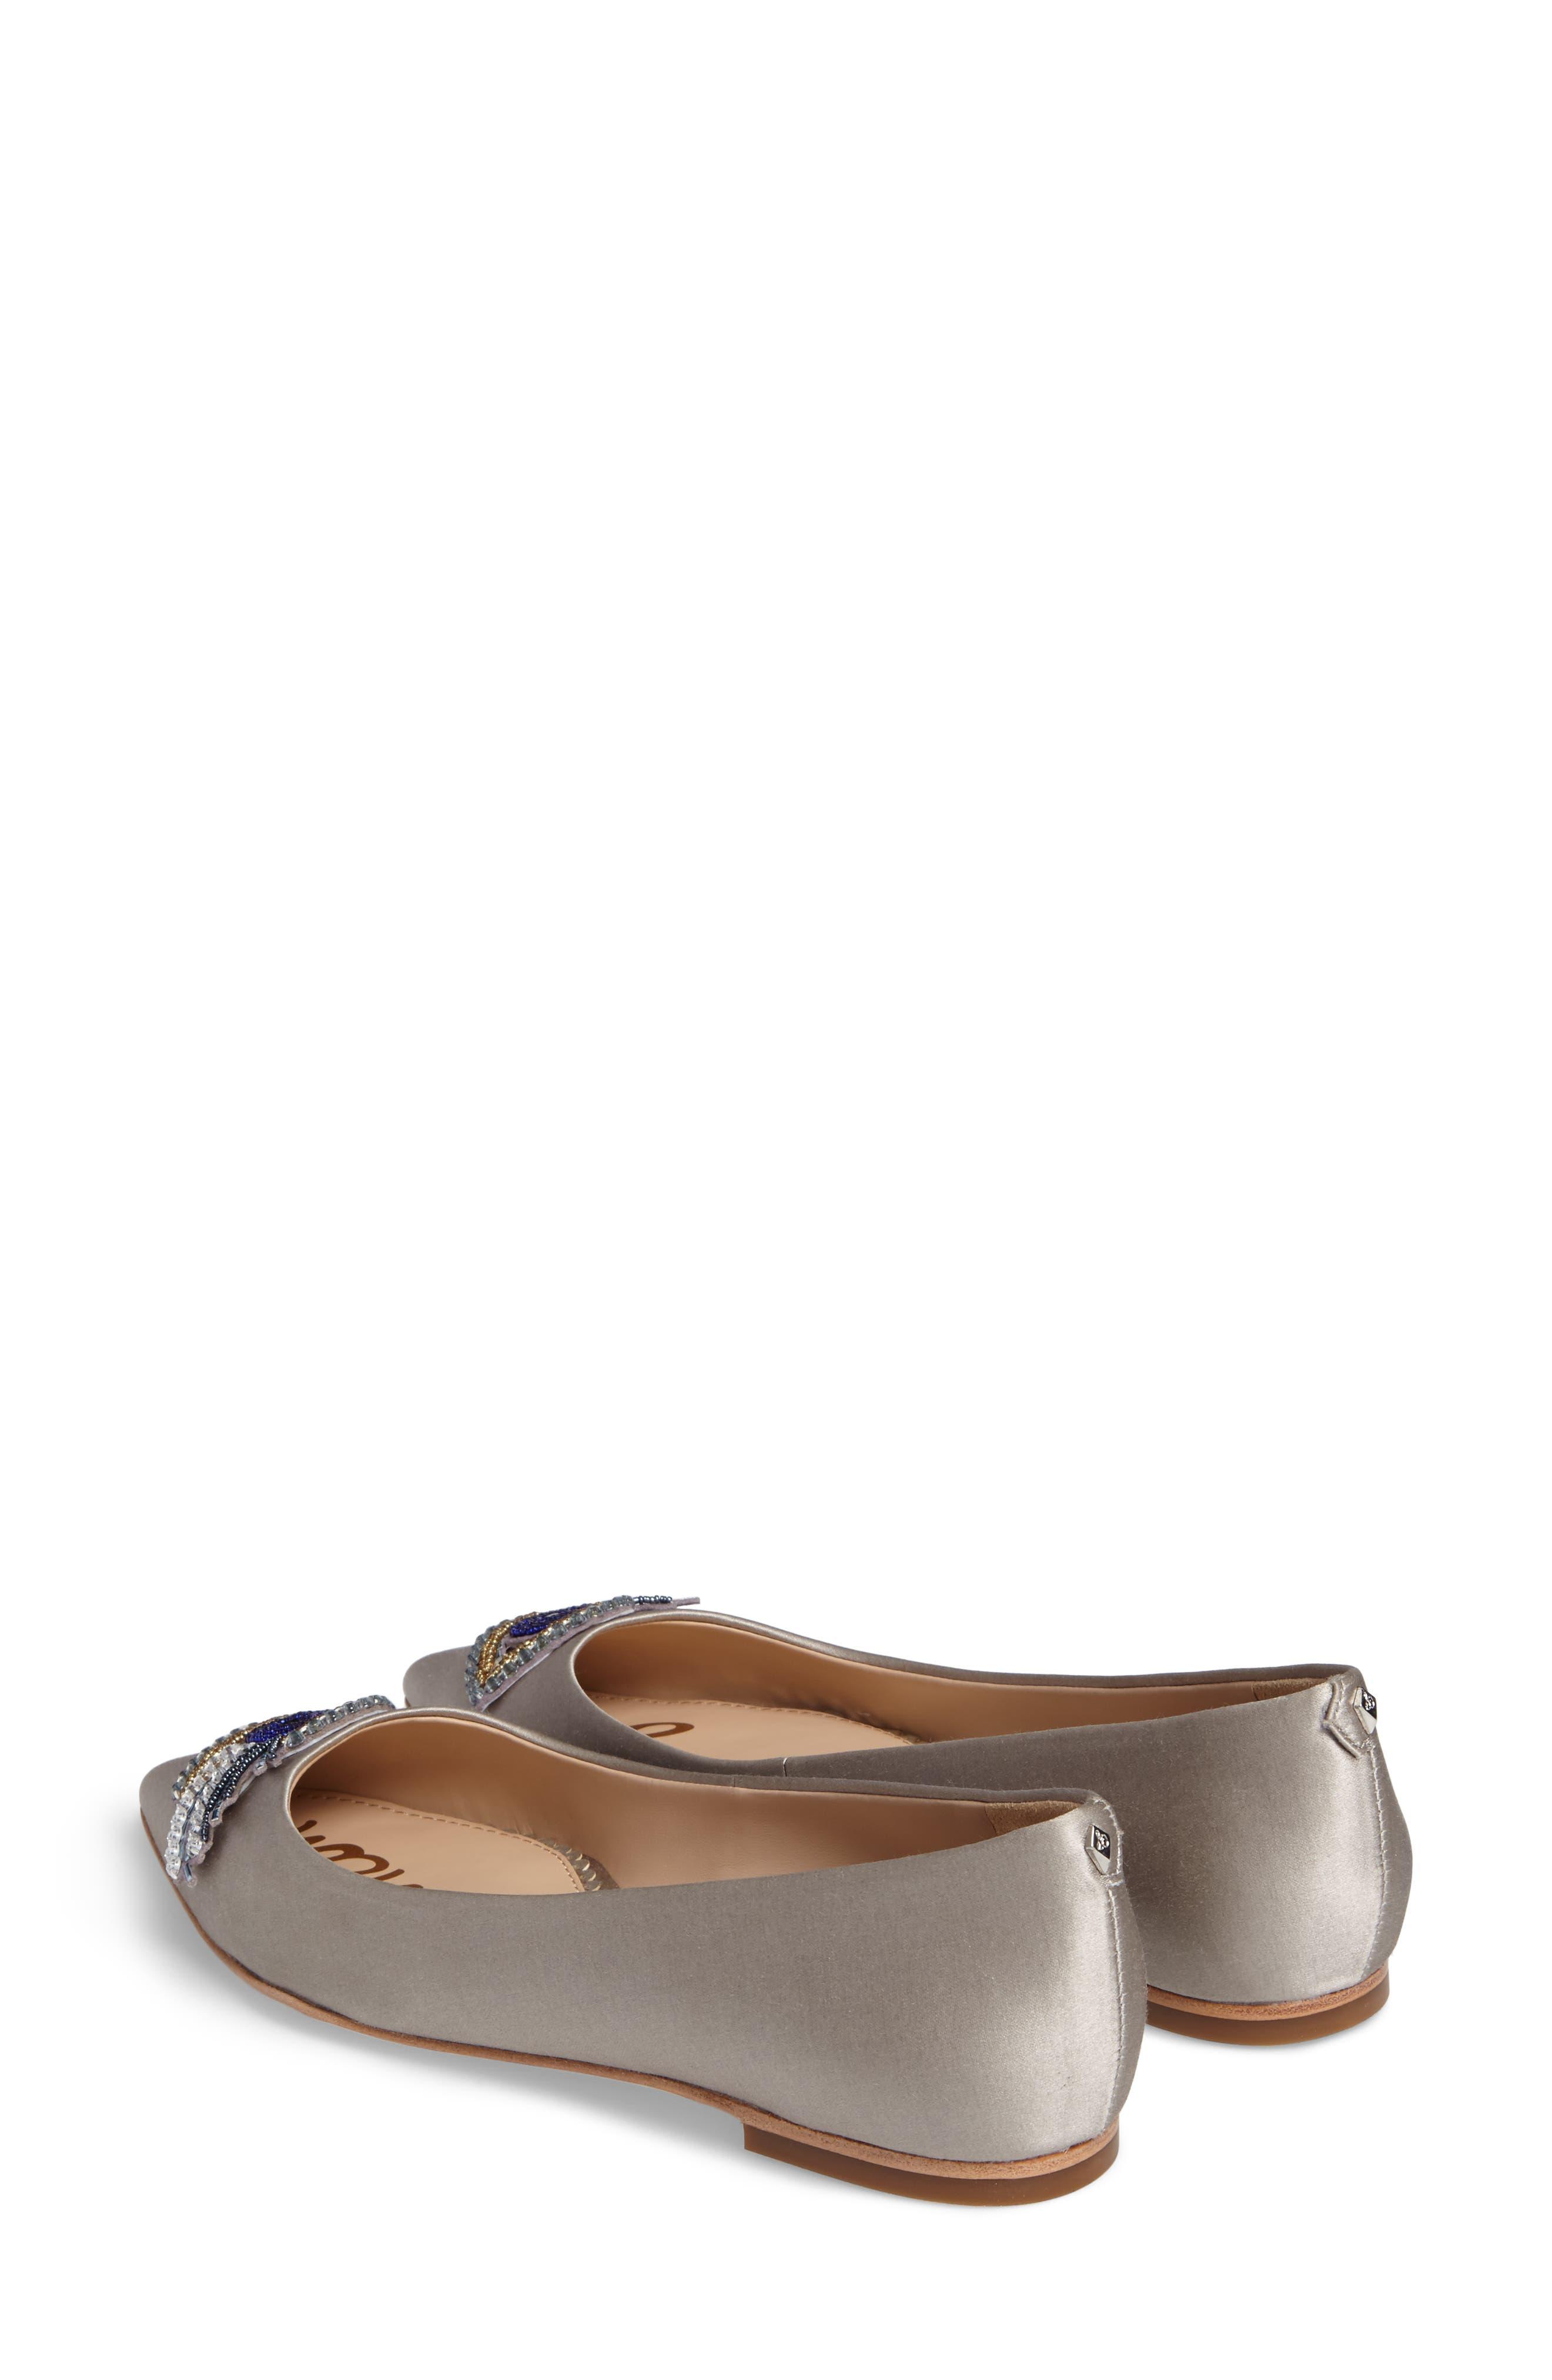 Rafaella Pointy Toe Ballet Flat,                             Alternate thumbnail 3, color,                             020